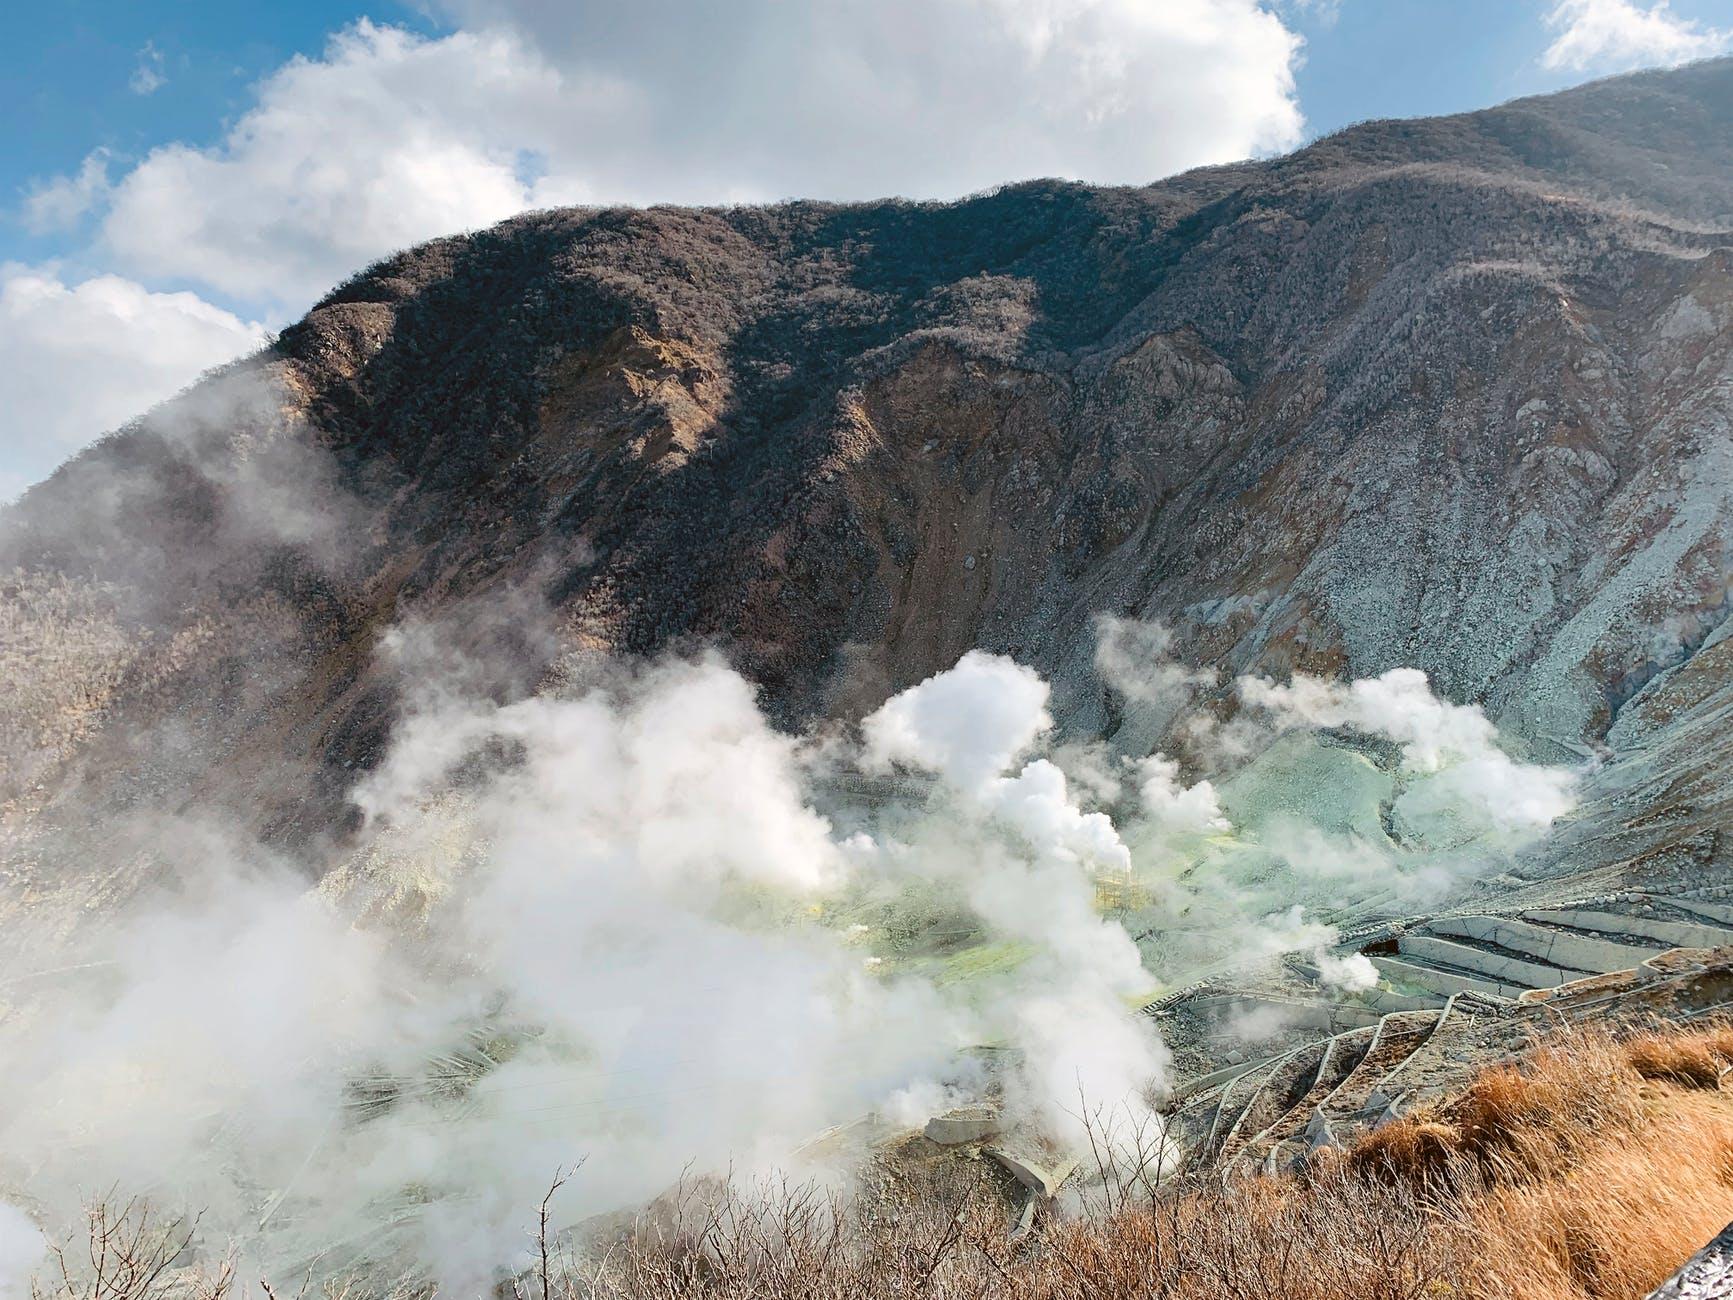 dramatic volcanic terrain with fumingmist